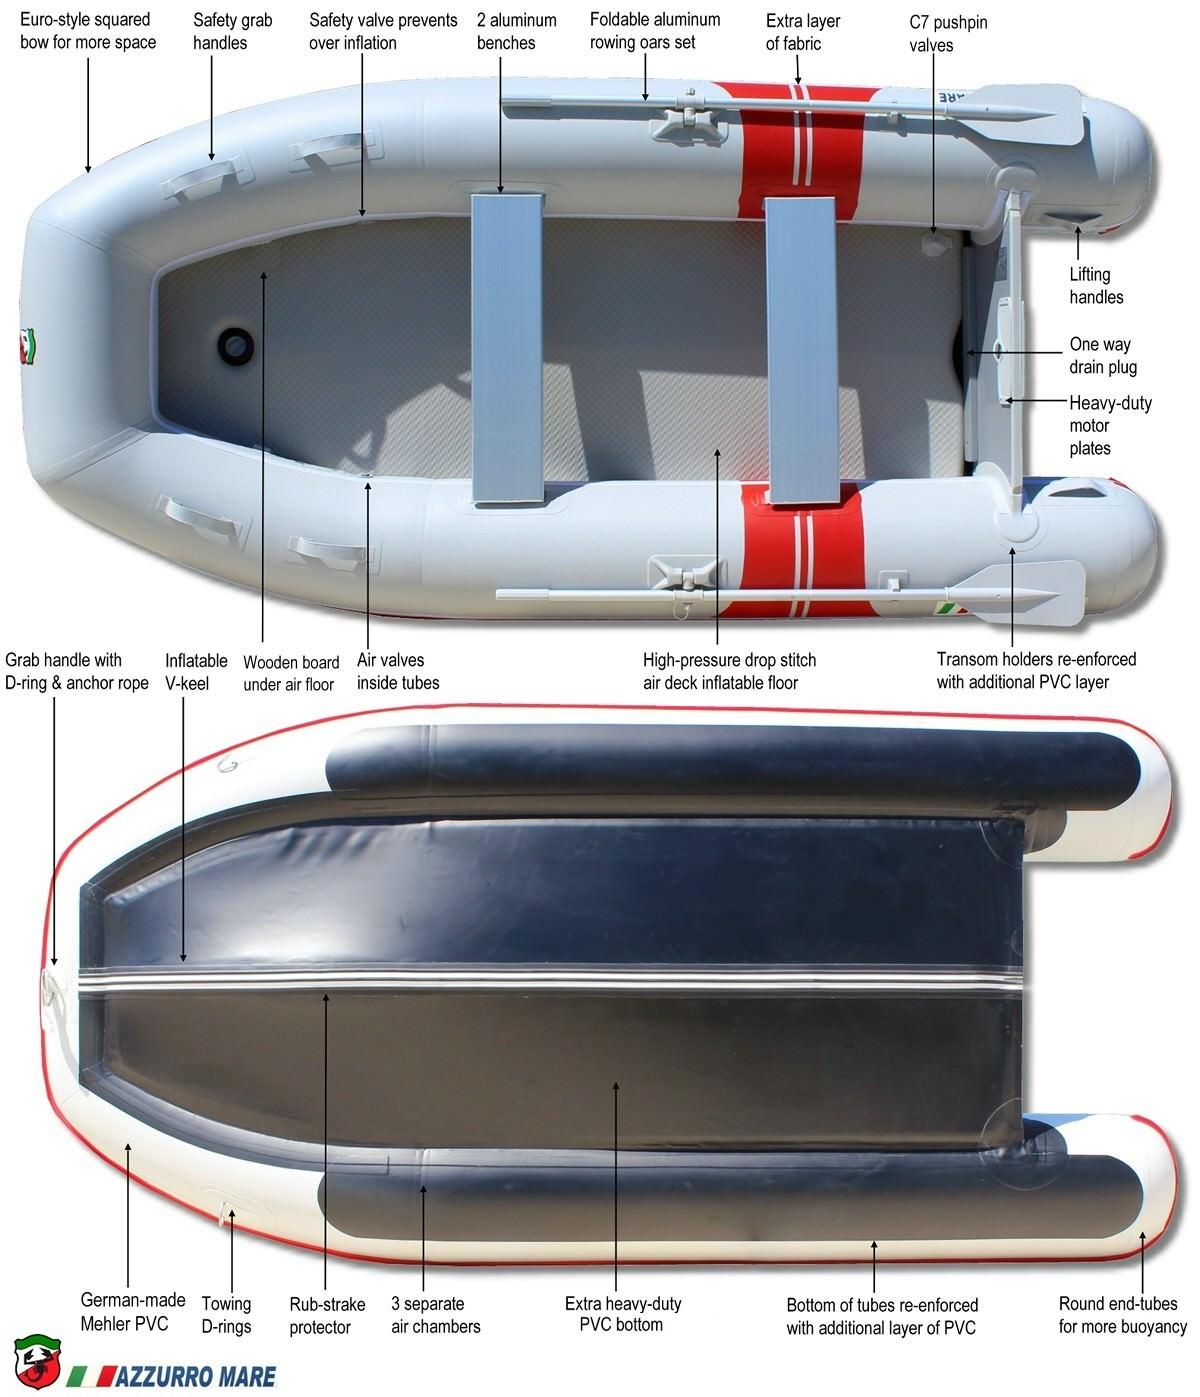 Azzurro Mare Inflatable Boat Specs